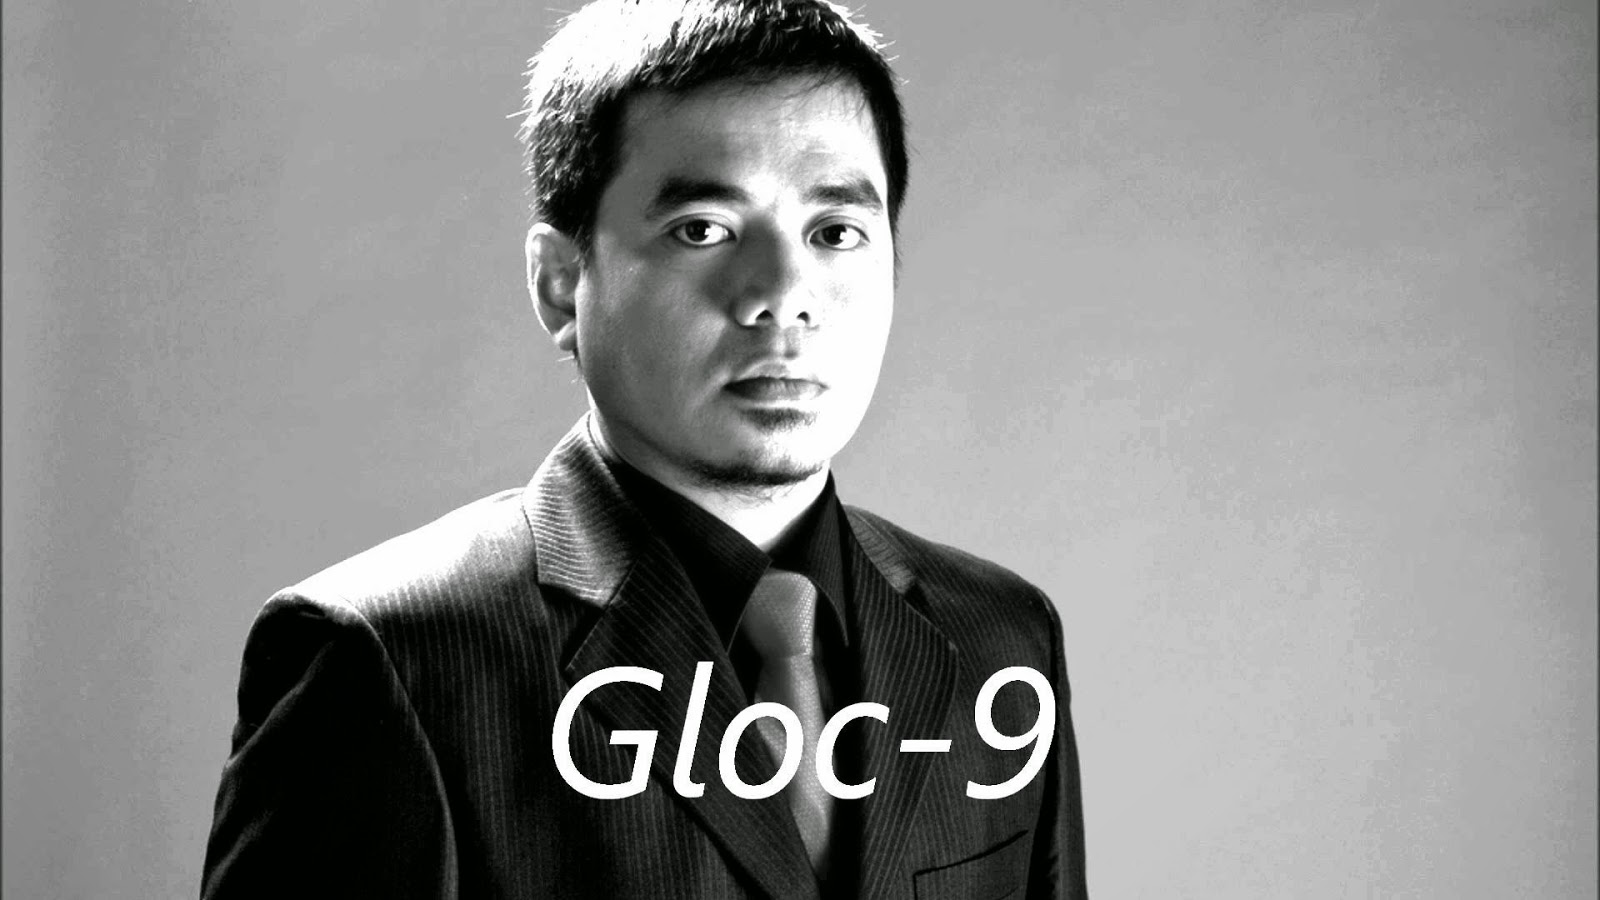 Gloc 9 To Release Life Documentary Instead of Album